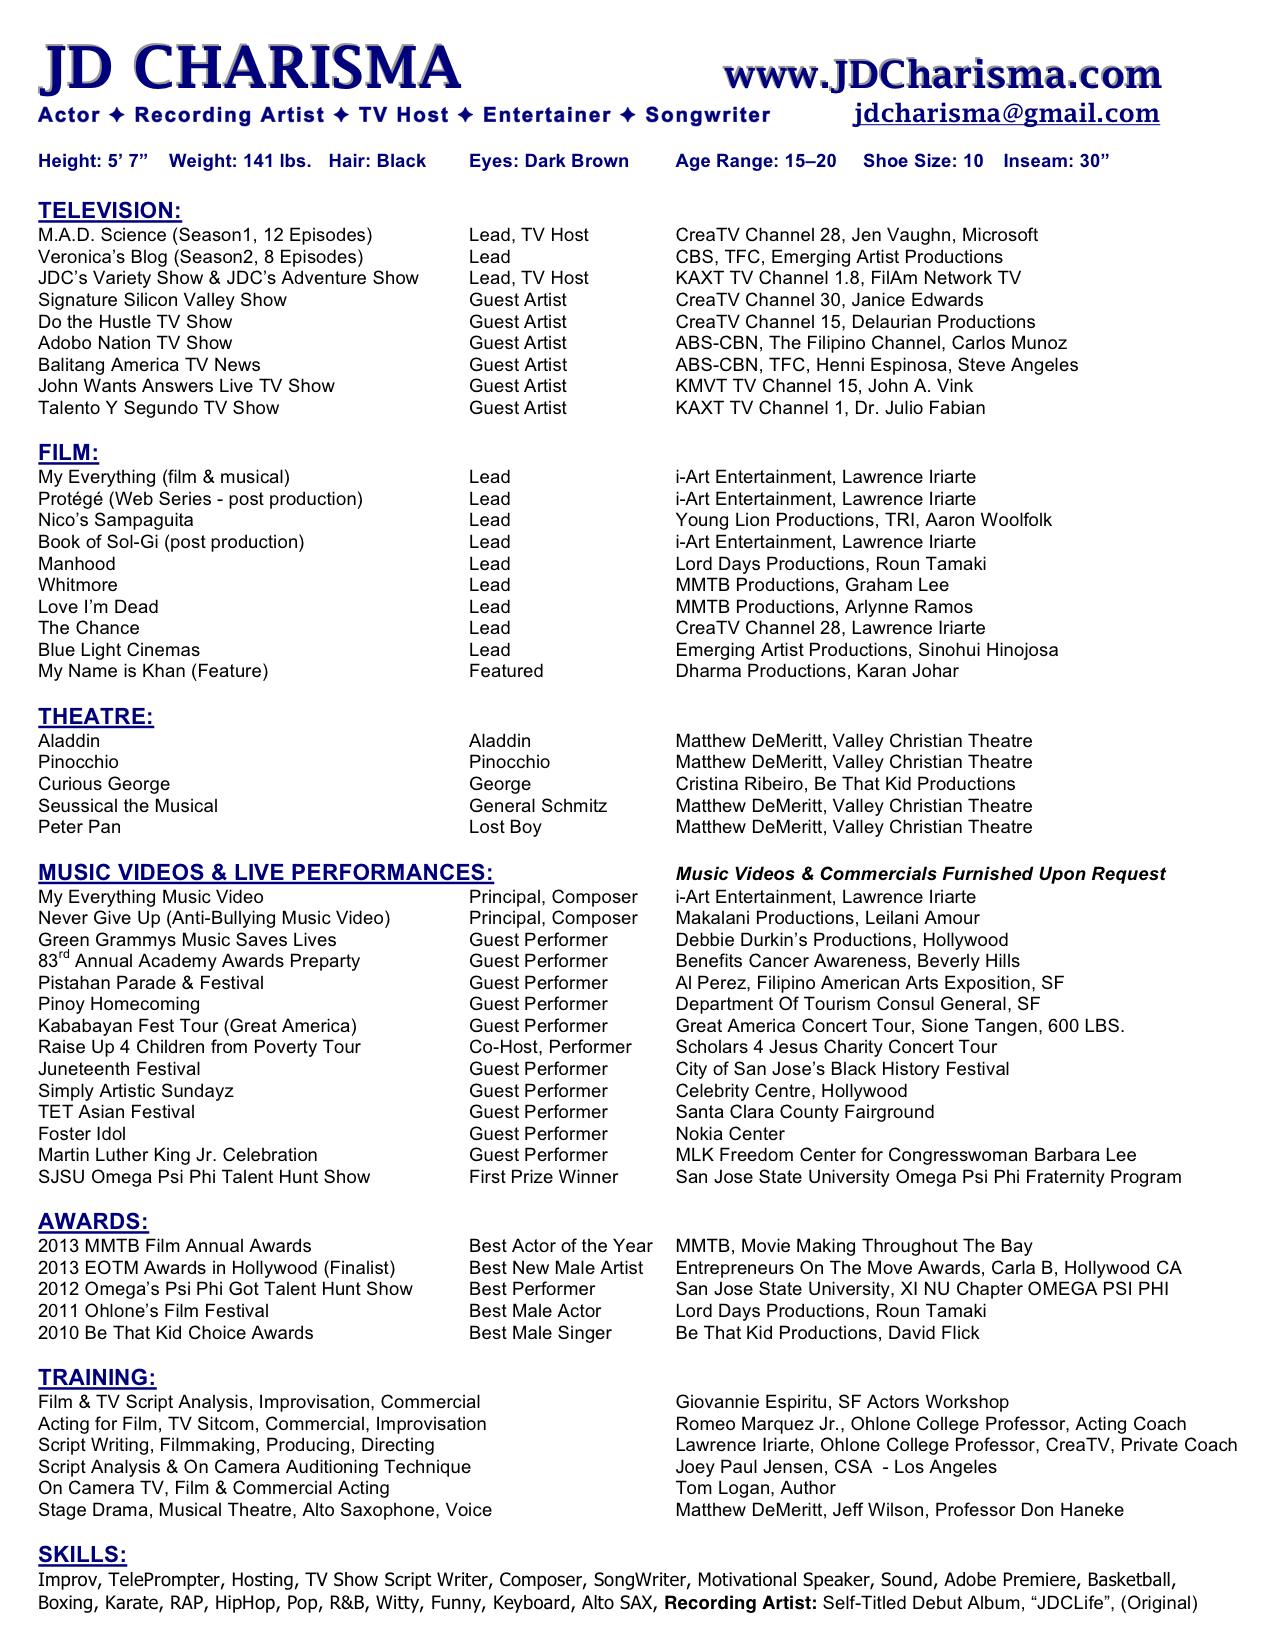 JD CHARISMA RESUME 3-30-2014.jpg